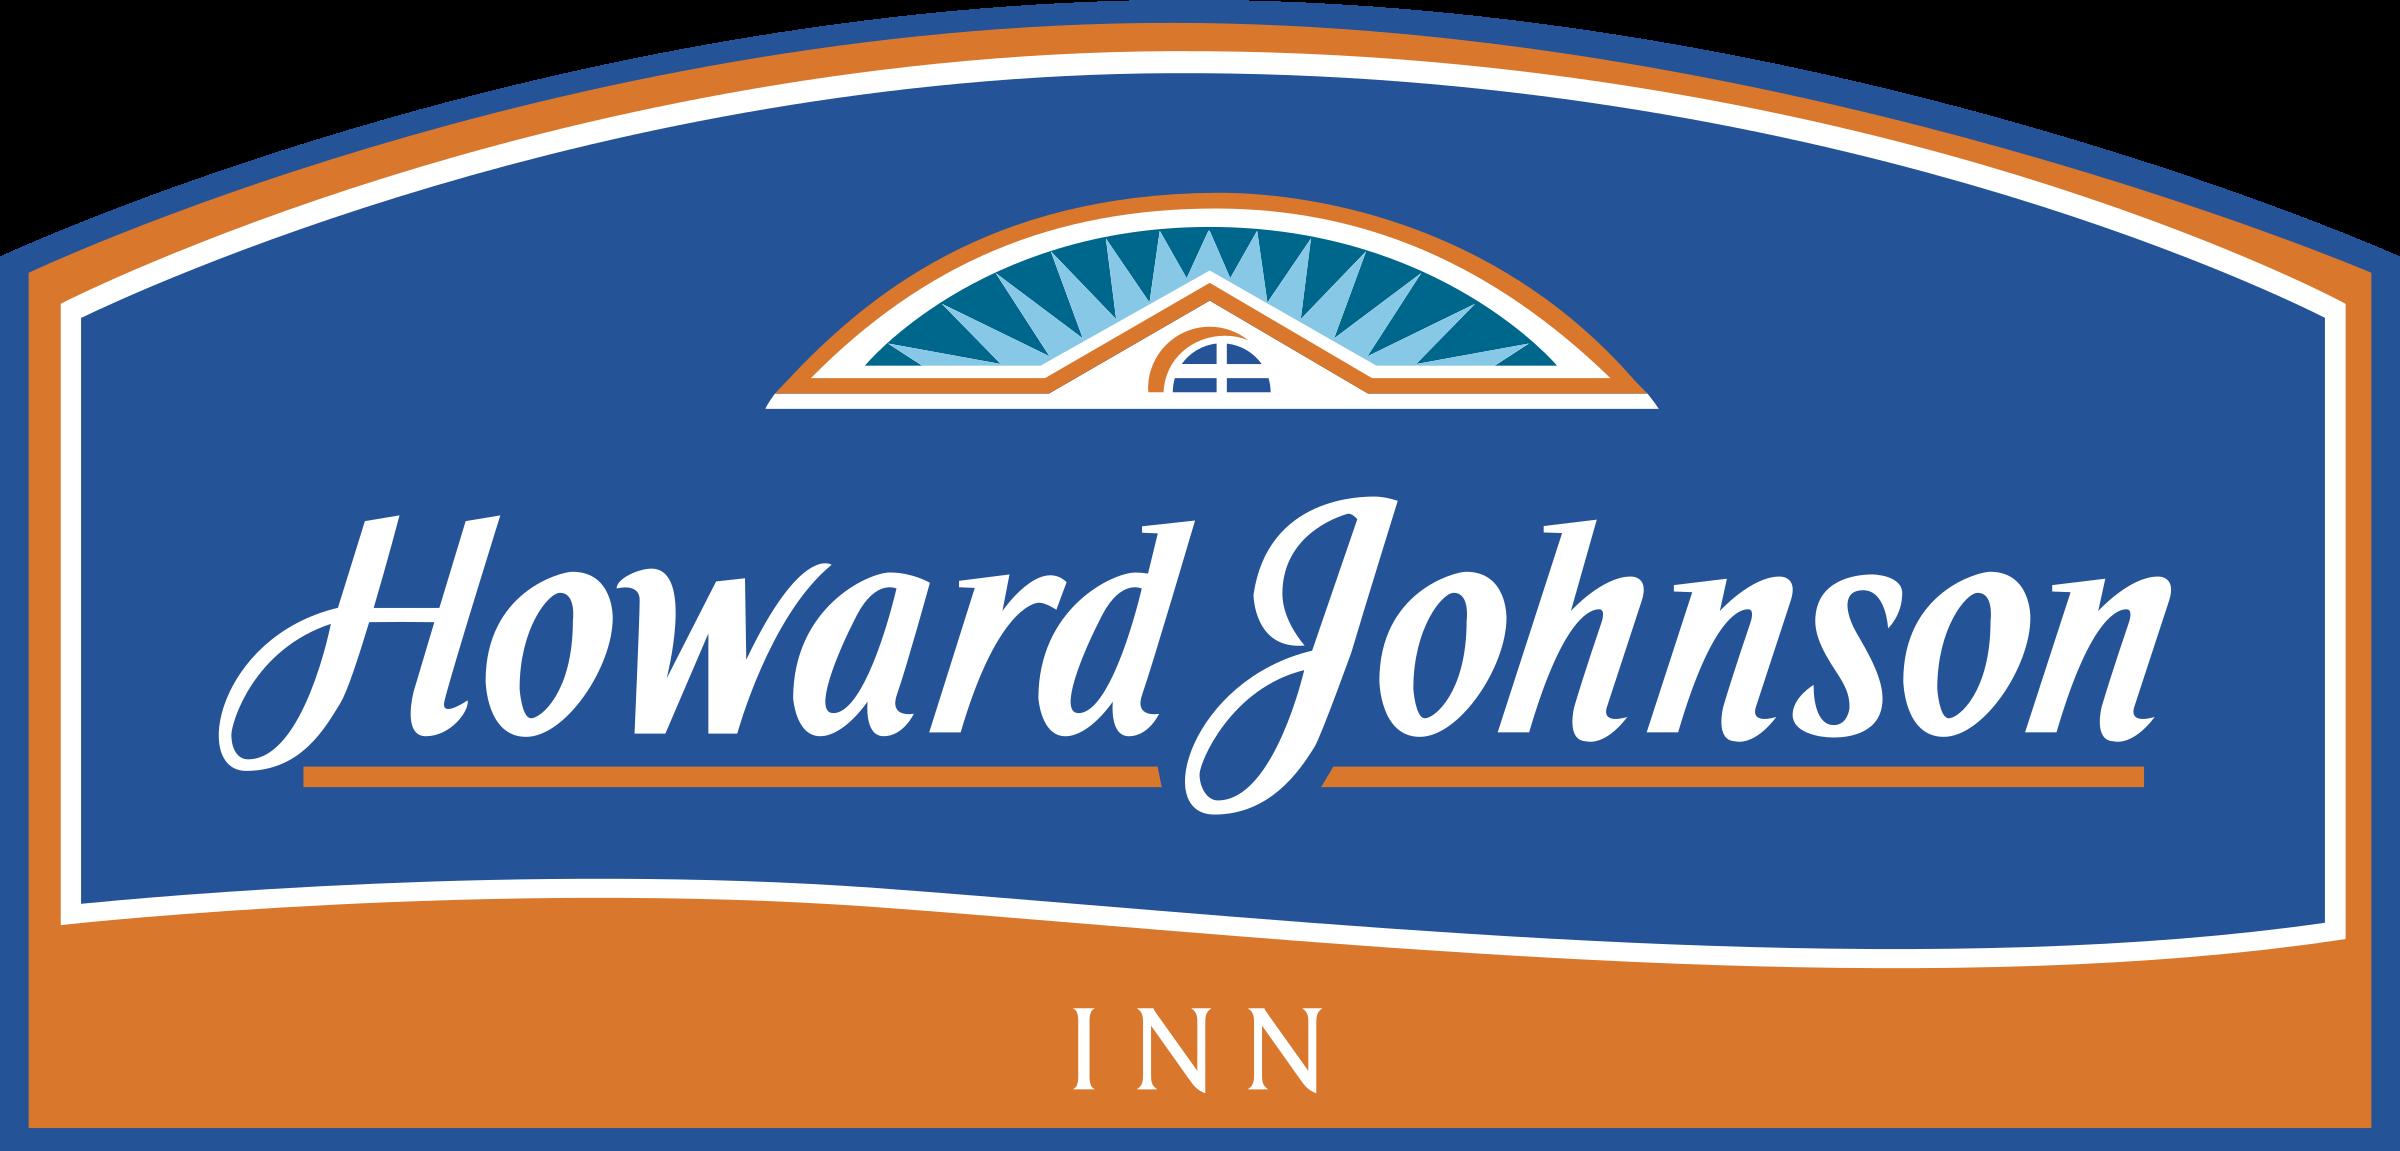 howard-johnson-6-logo-png-transparent@2x.png